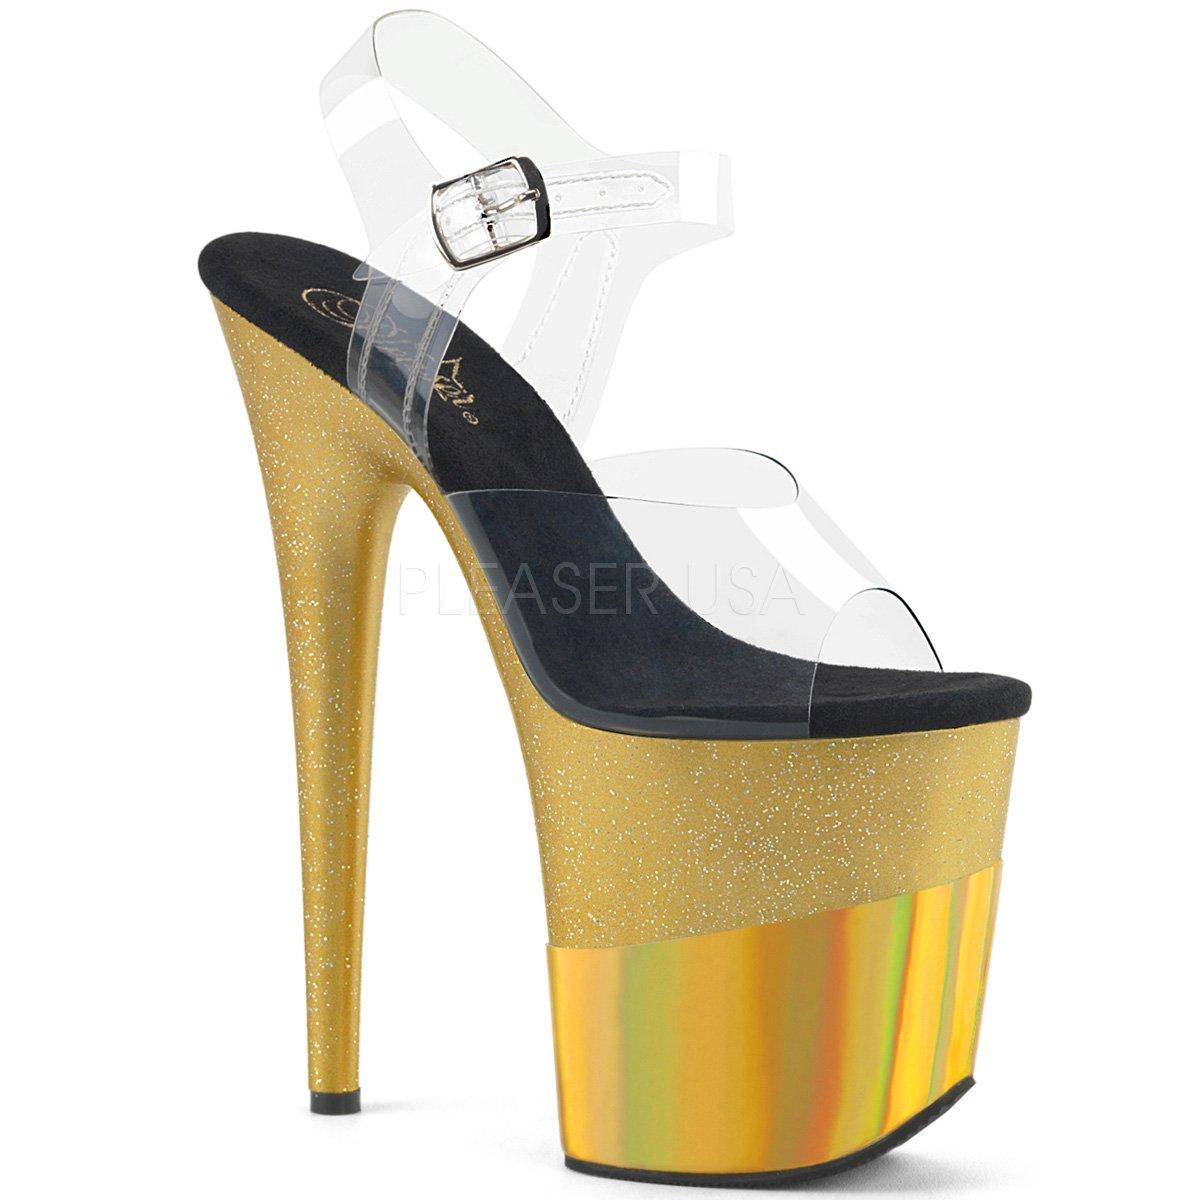 Pleaser Womens FLAMINGO-808-2HGM/C/GGHG US Sandals B078MT7LY1 10 B(M) US FLAMINGO-808-2HGM/C/GGHG 30ce08